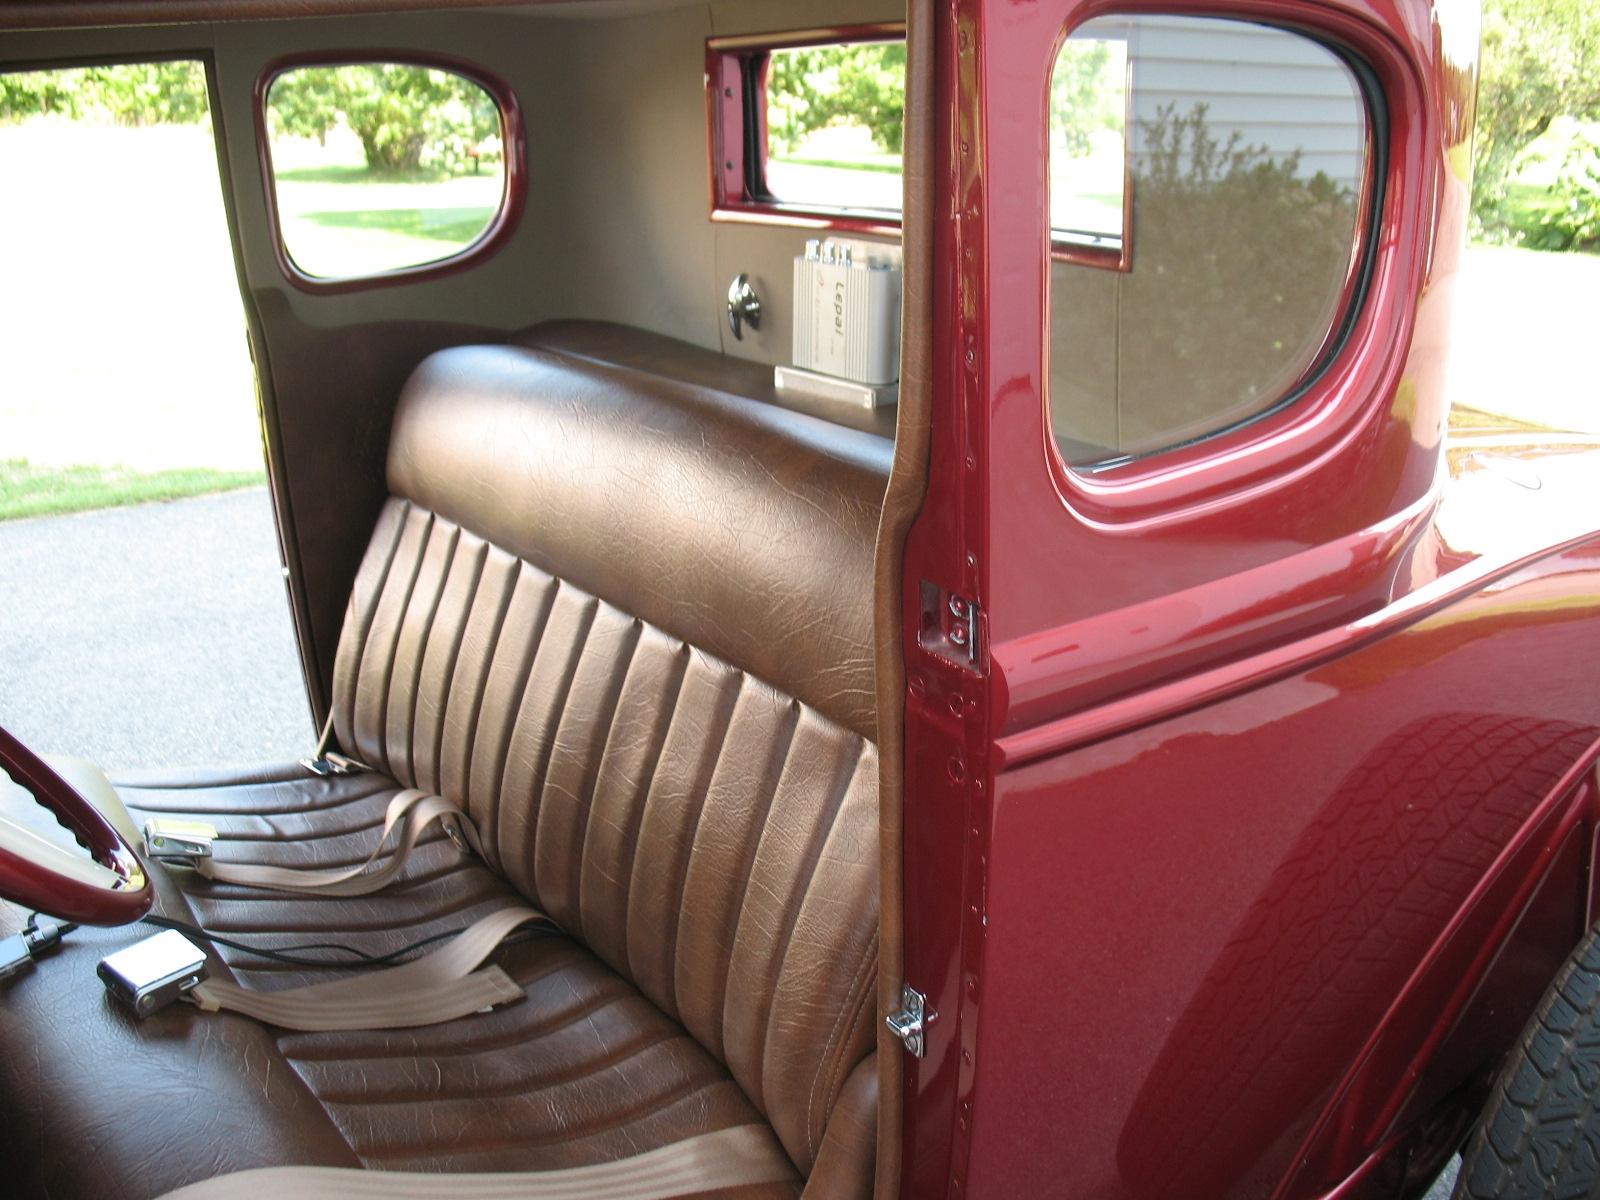 ud Trucks Interior images  Hd Image Galleries on Hdimagelib